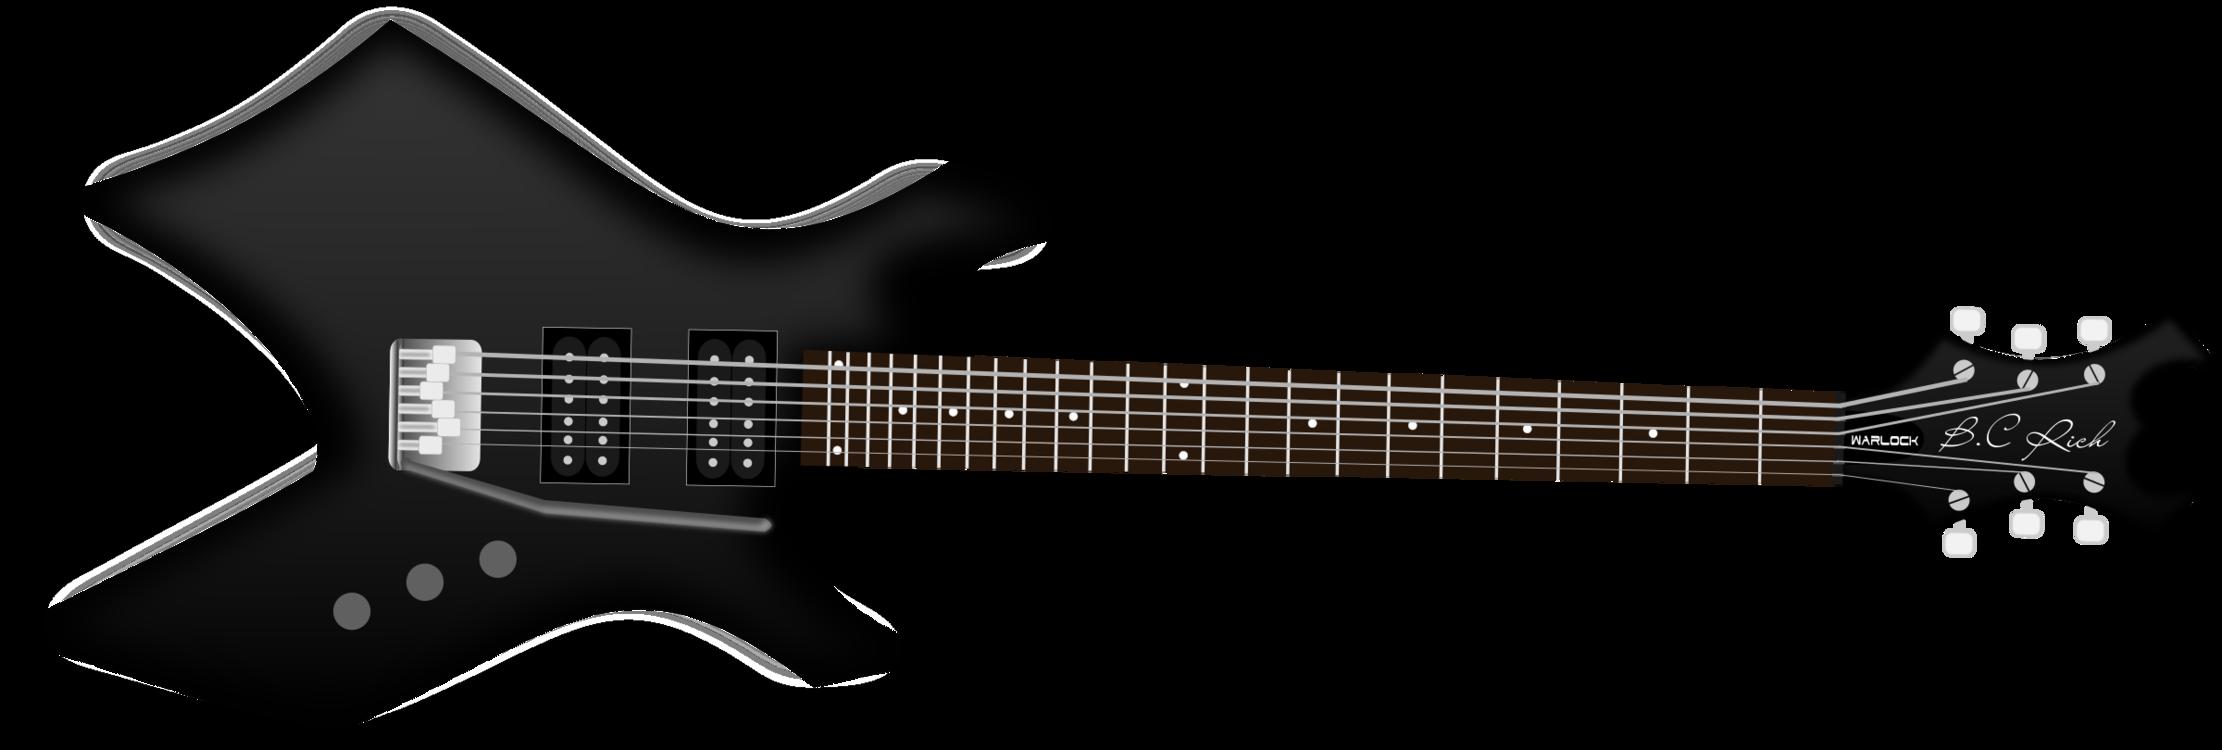 B C Rich Warlock Electric Guitar Bass Guitar Free Commercial